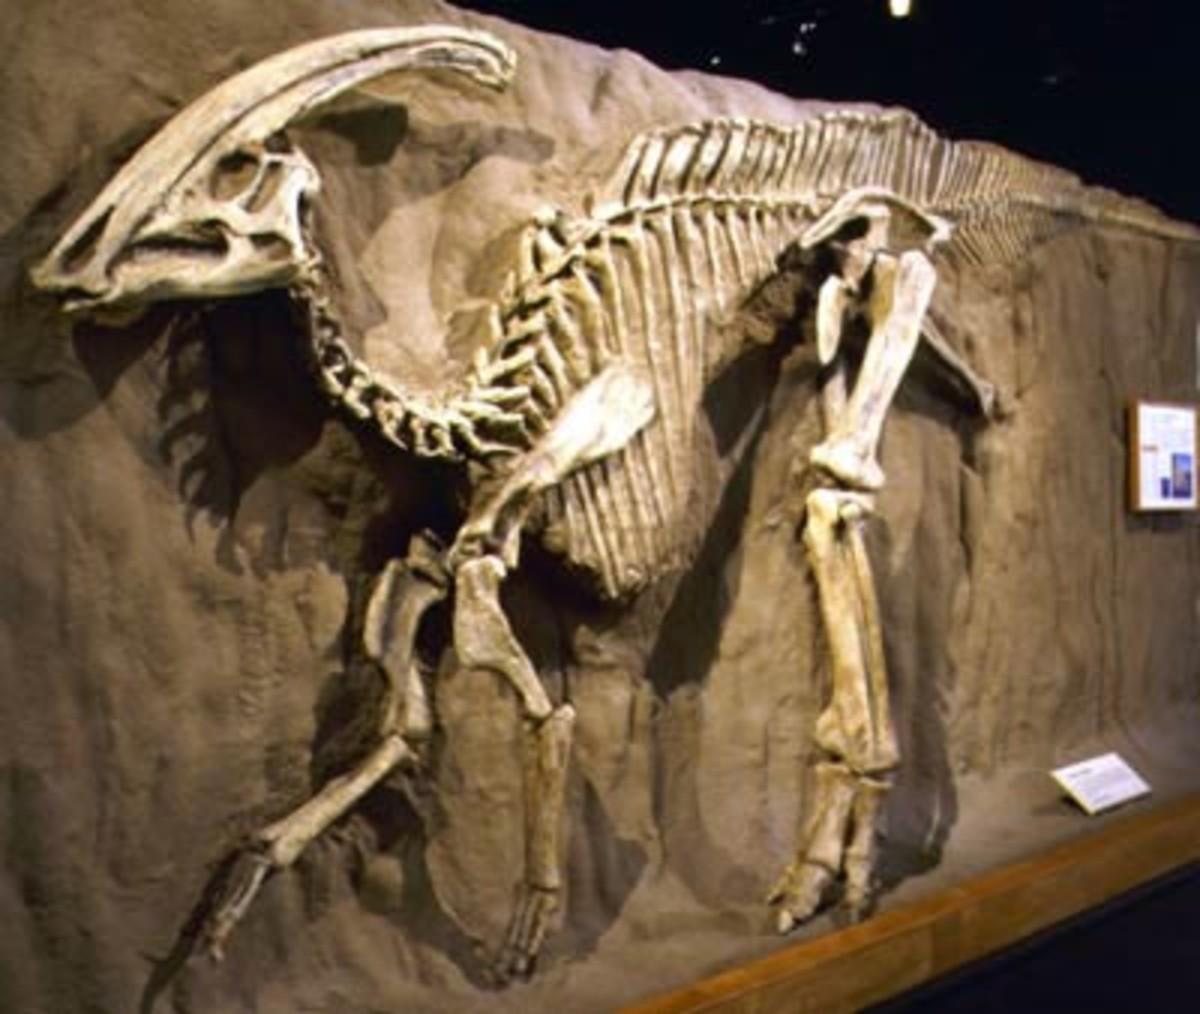 Parasaurolophus, one of the many dinosaurs to go extinct.